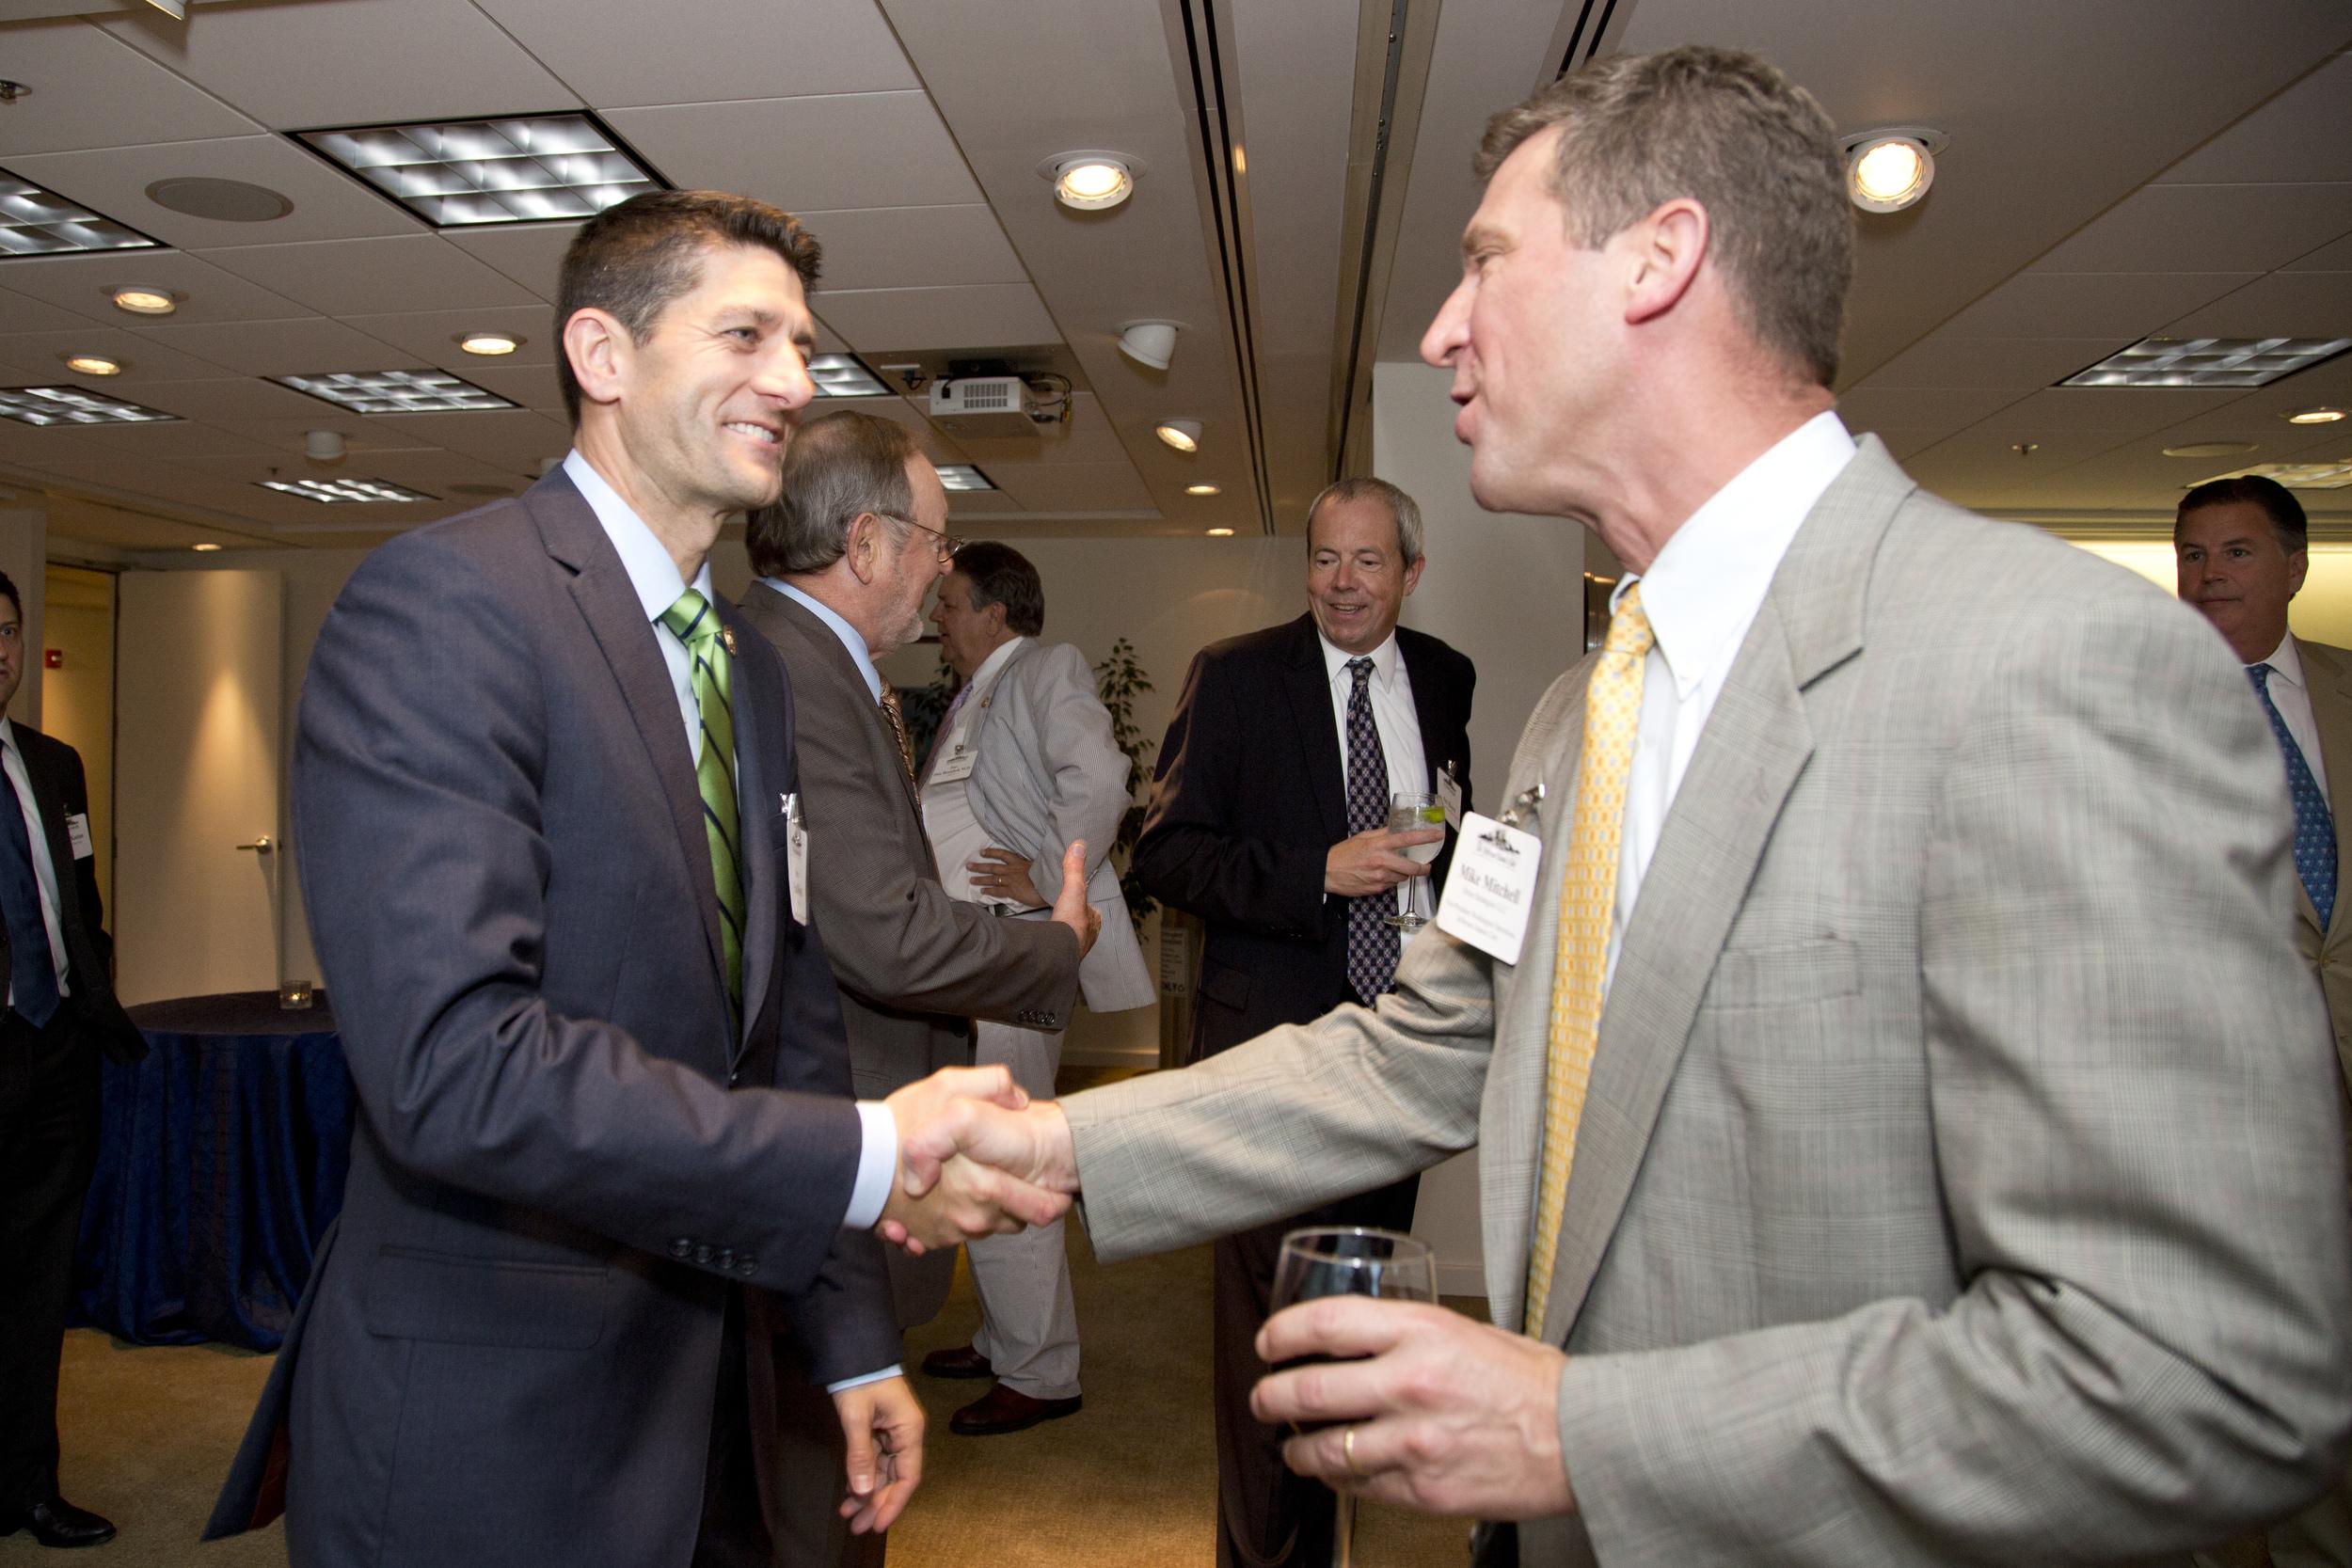 Previous Citizen of the Year awardee Representative Paul Ryan.